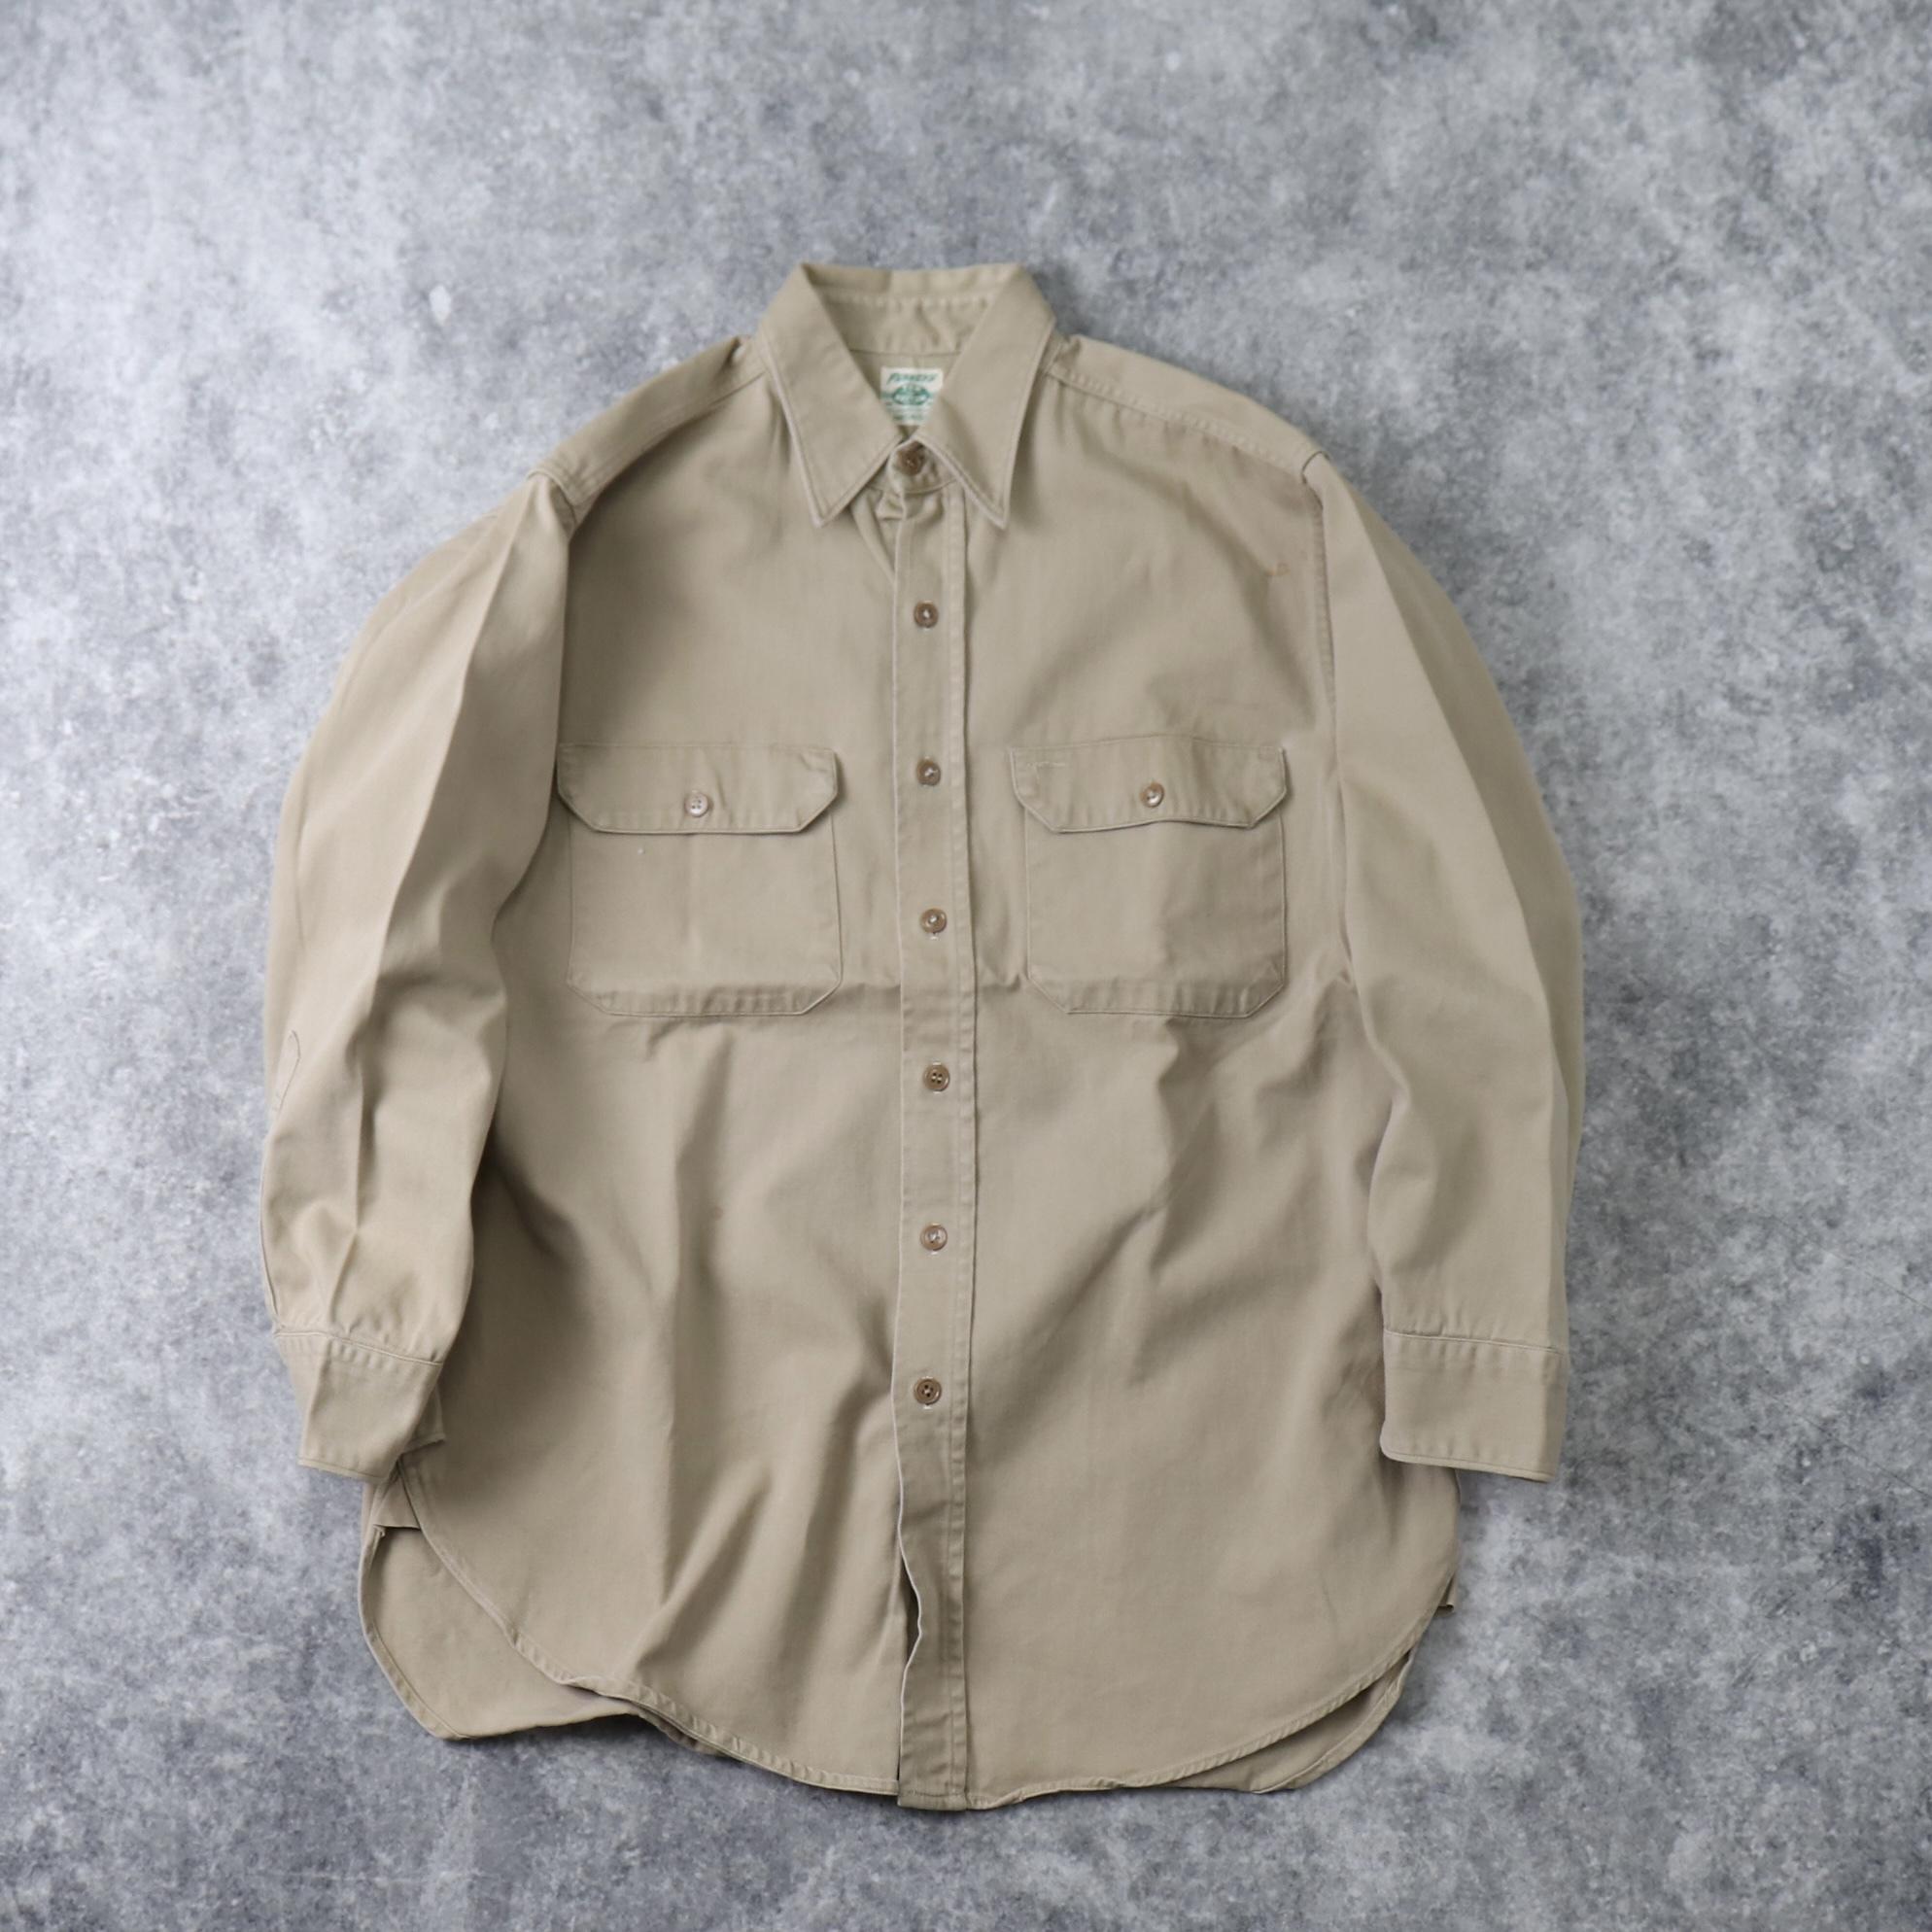 50's Penny's TOP-N-BOTTOM Work shirts 50年代 ワークシャツ J.C.Penny ペニーズ トップボトム  A662